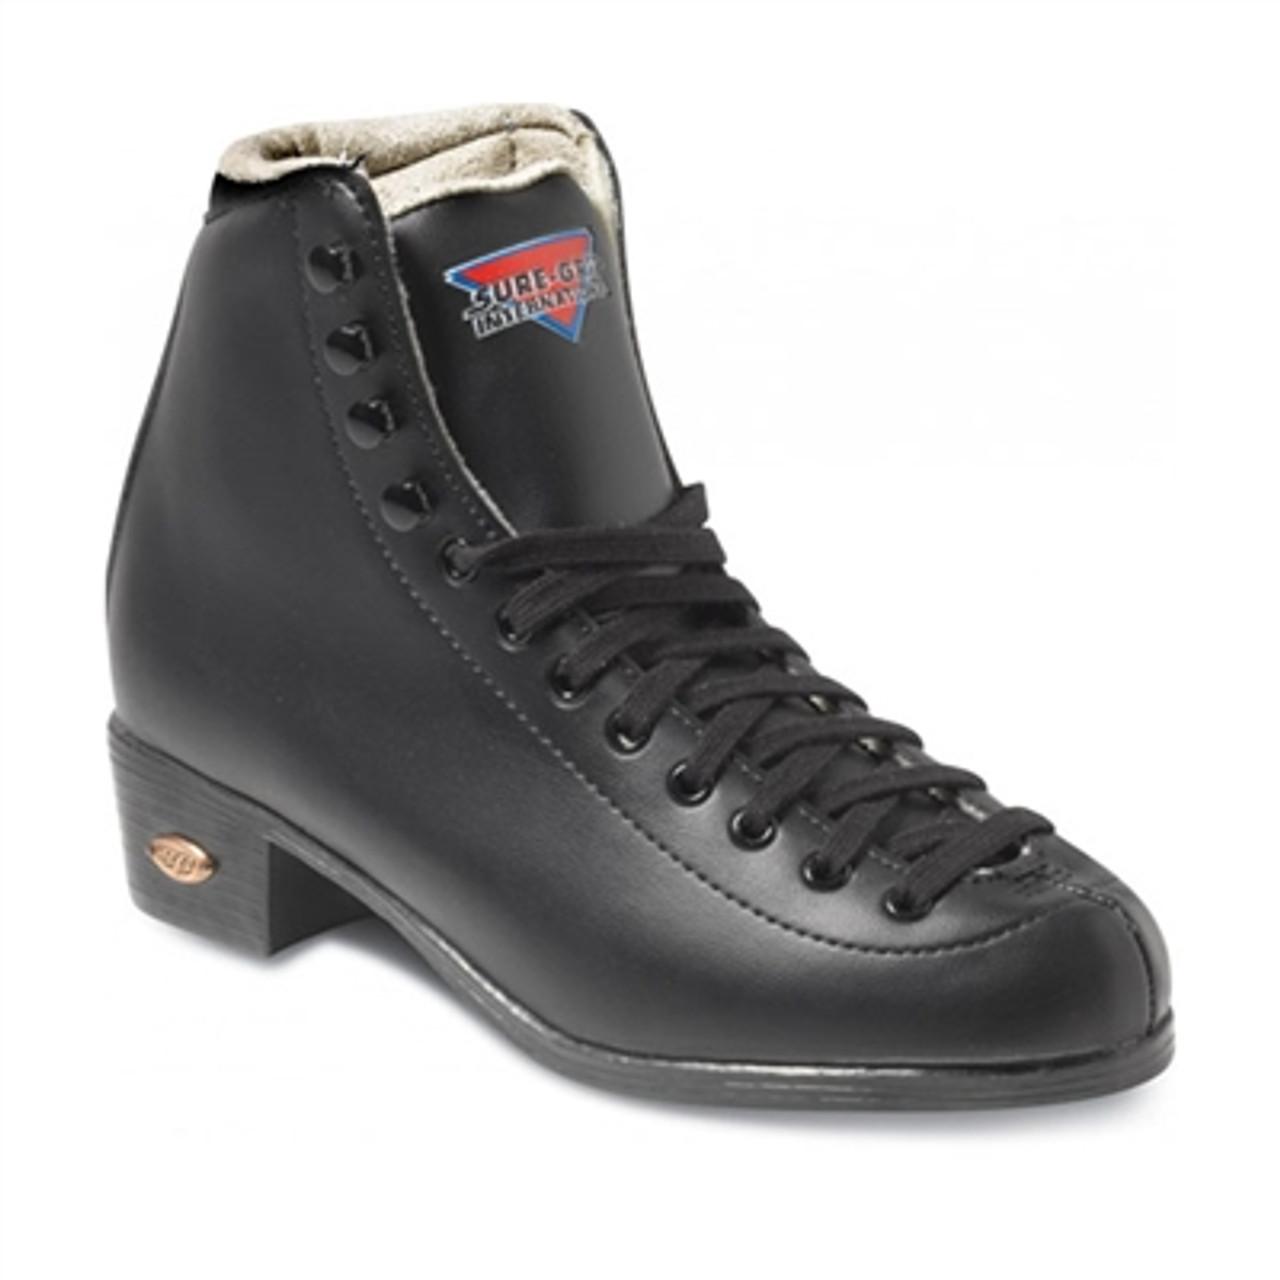 Sure Grip 37 Boot